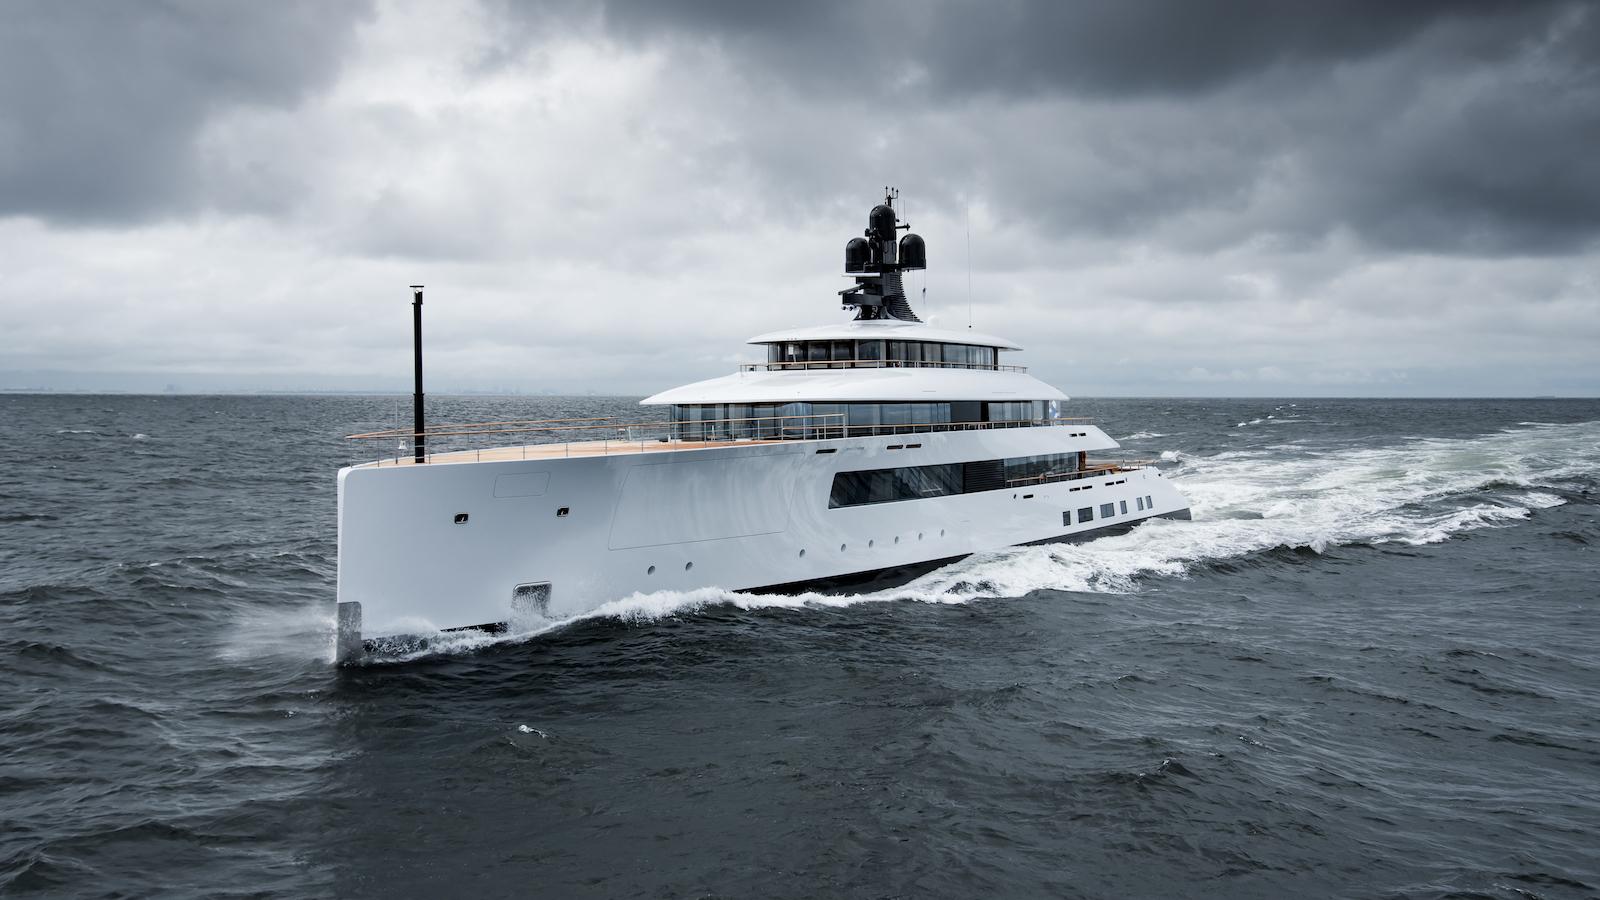 boat-international-design-and-innovation-awards-finalists-2020-syzygy-818